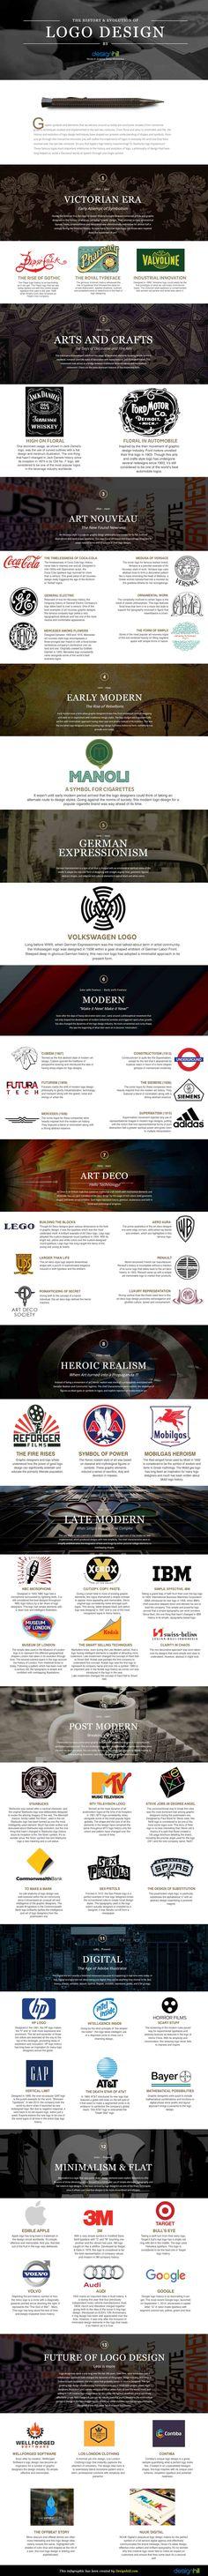 History & Evolution of Logo Design